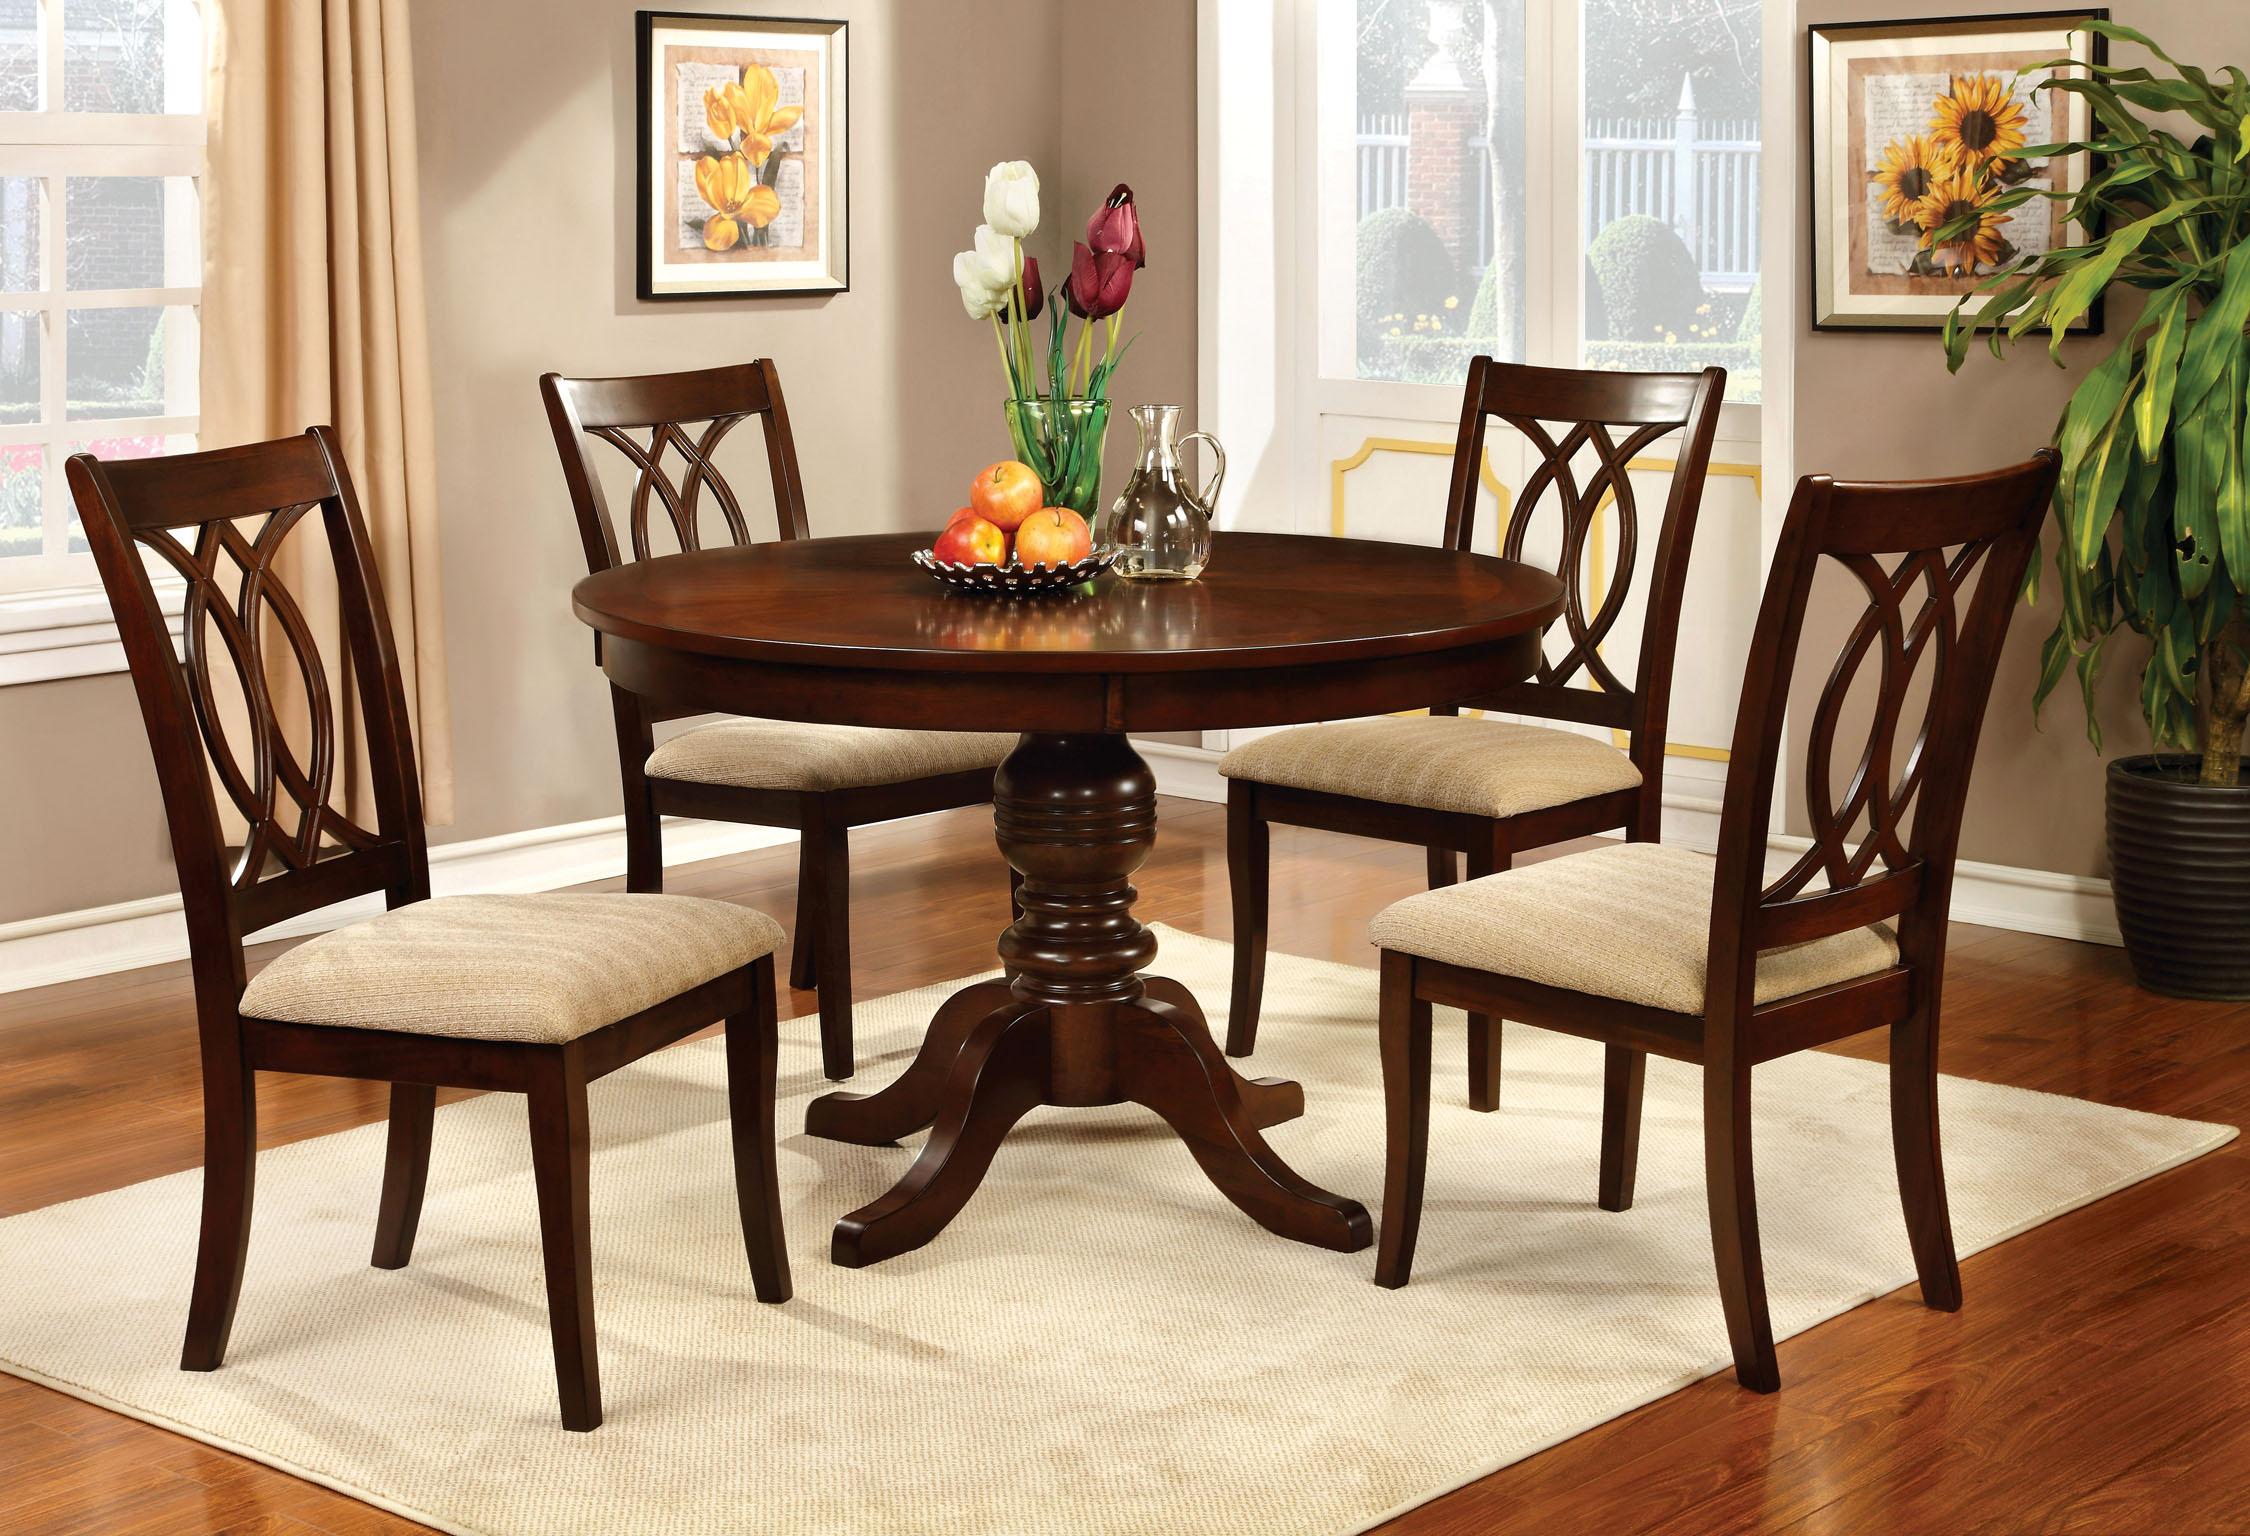 furniture of america brennan 5-piece round brown cherry dining set